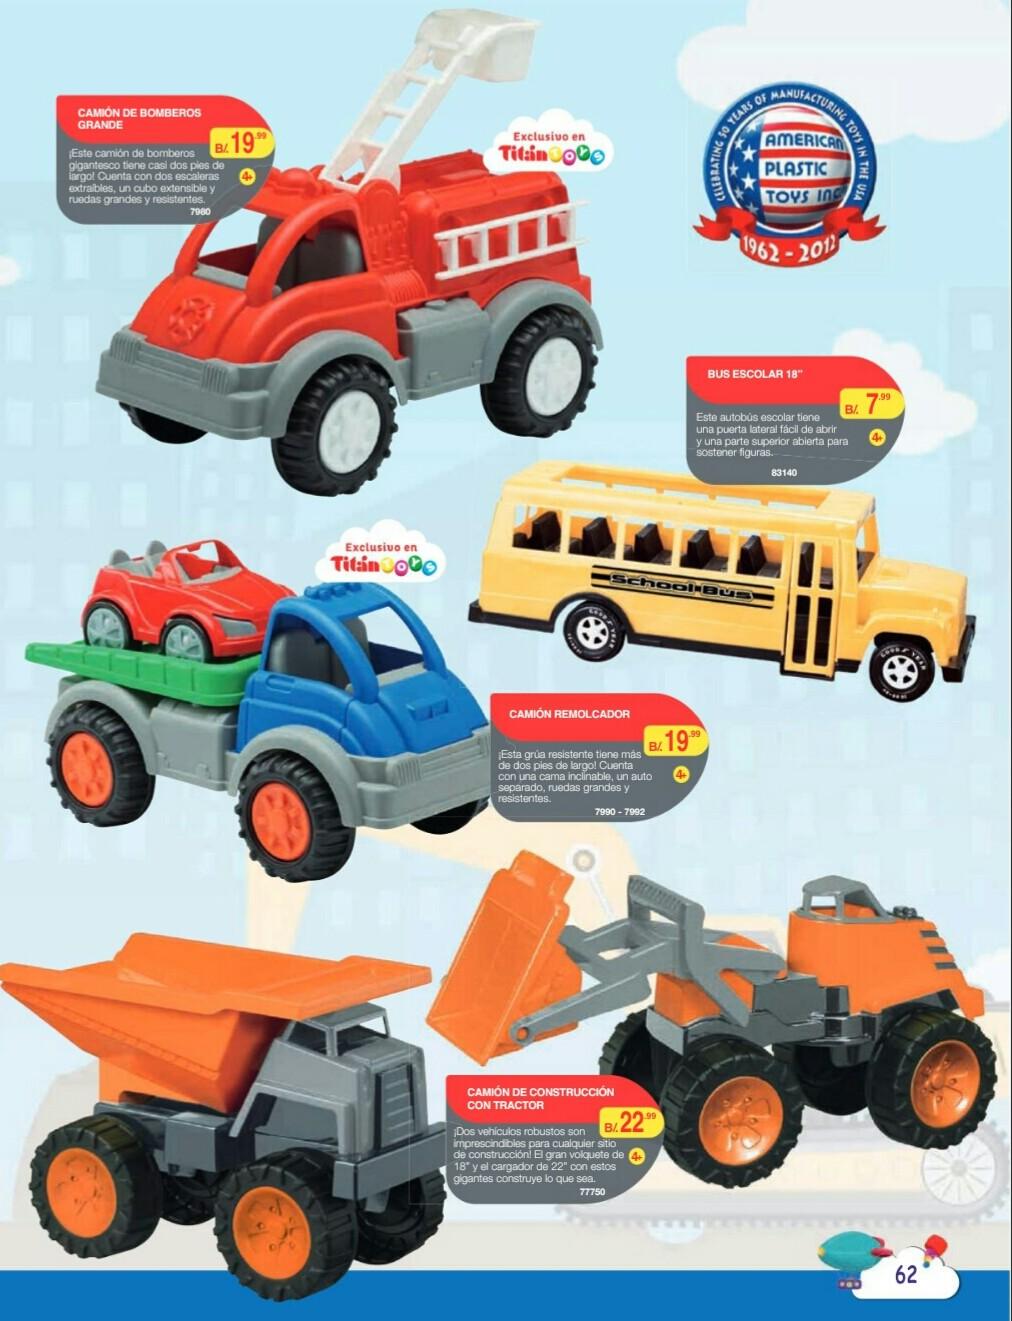 Catalogo juguetes Titan Toys 2018 p63